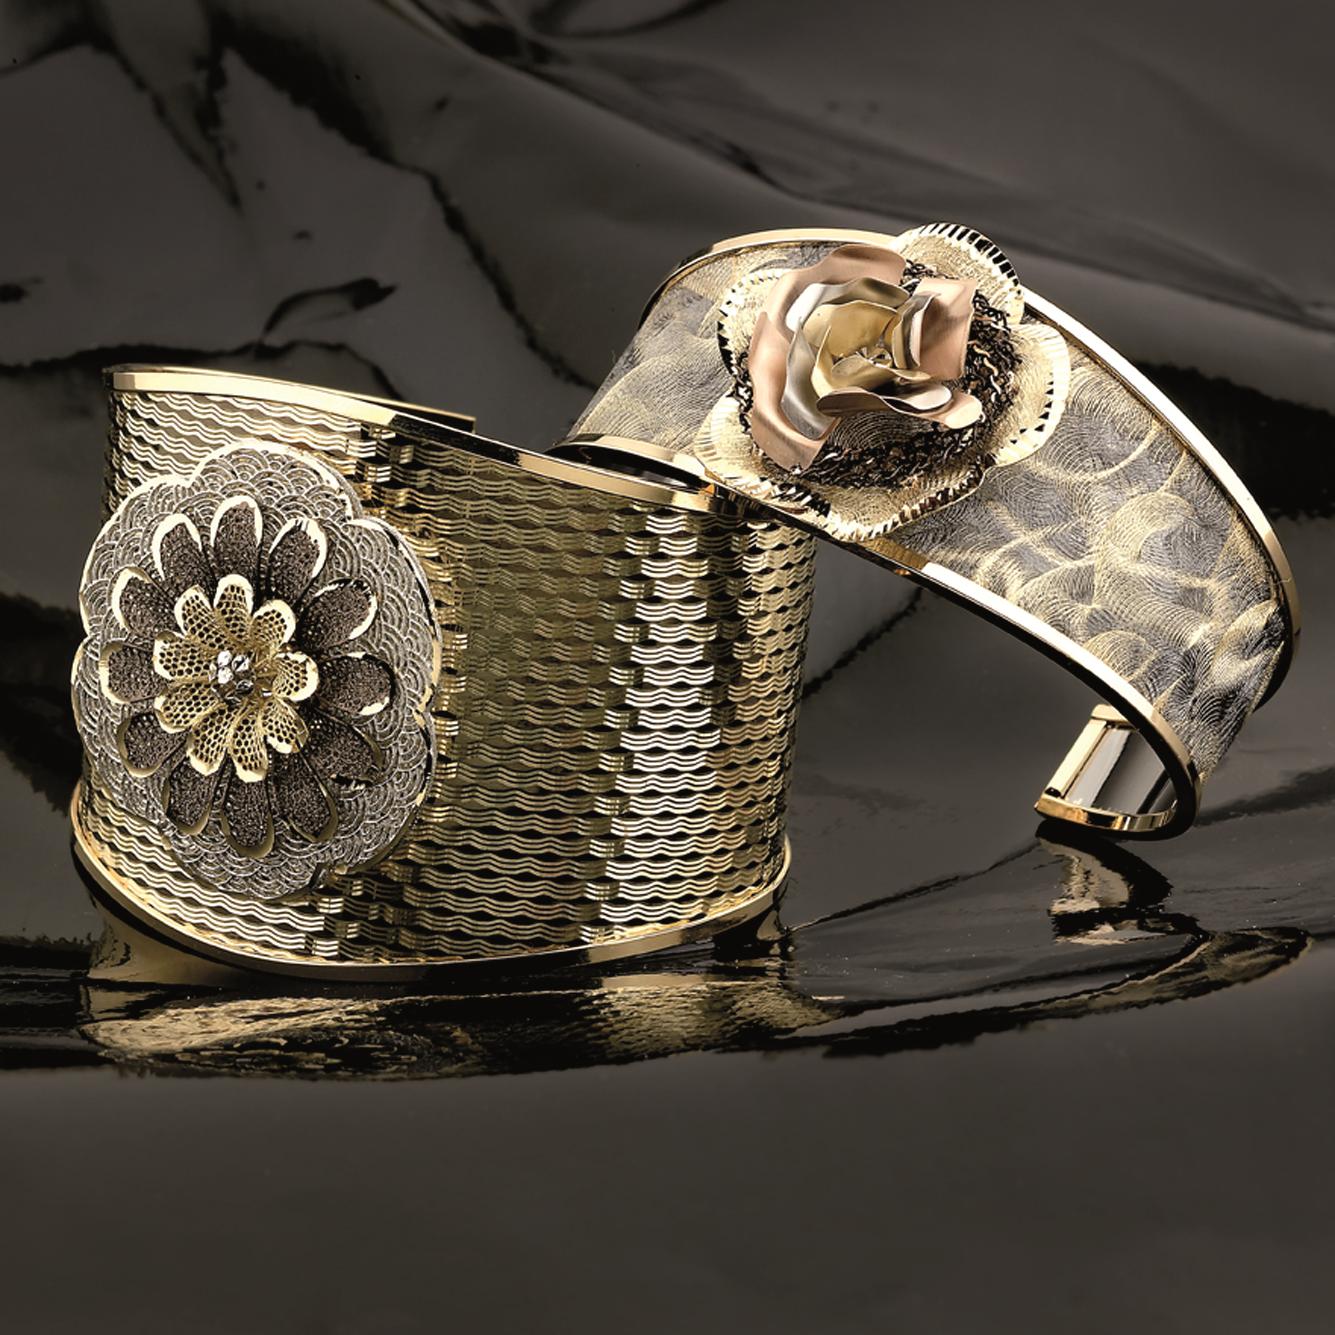 Jewelry News Network Italian Gold Jewelry the Focus of Arezzo Tradeshow